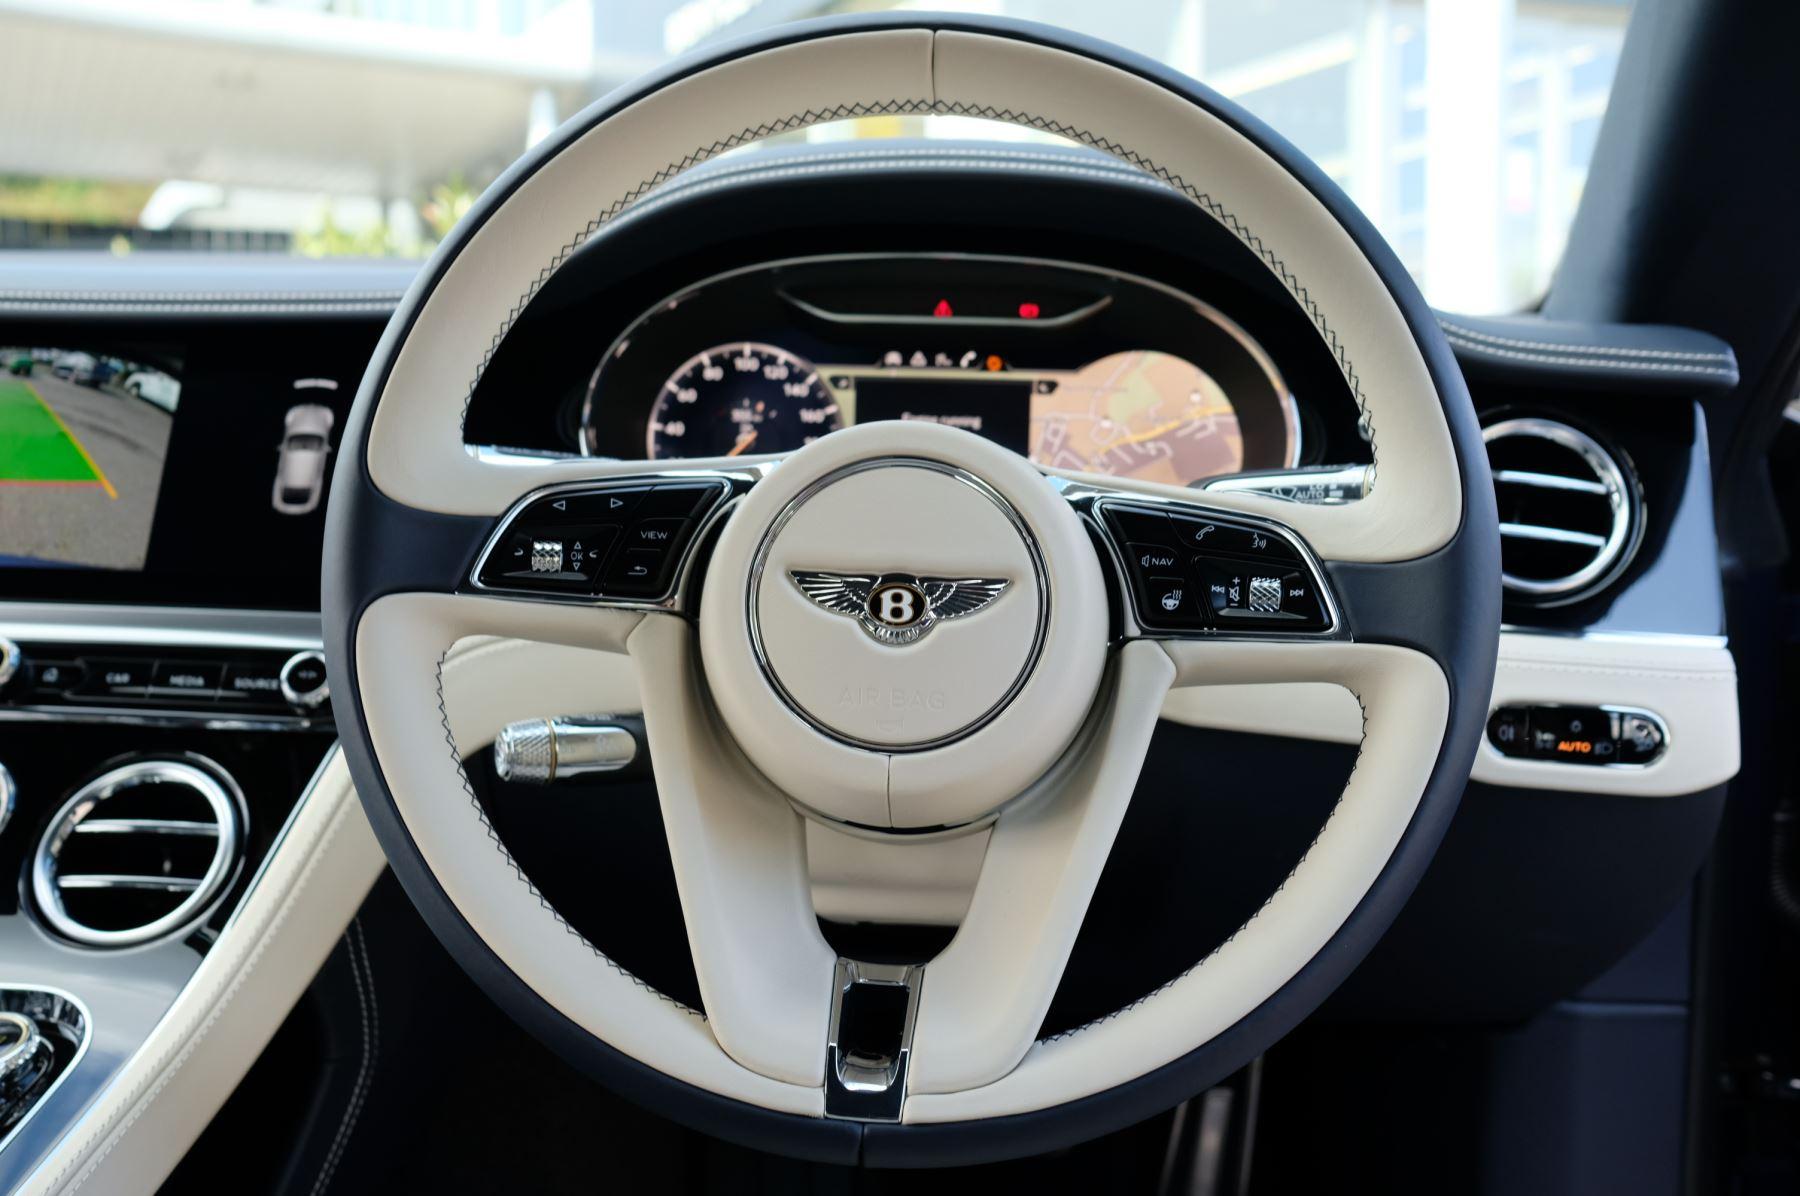 Bentley Continental GT 4.0 V8 2dr Mulliner Driving Specification image 15